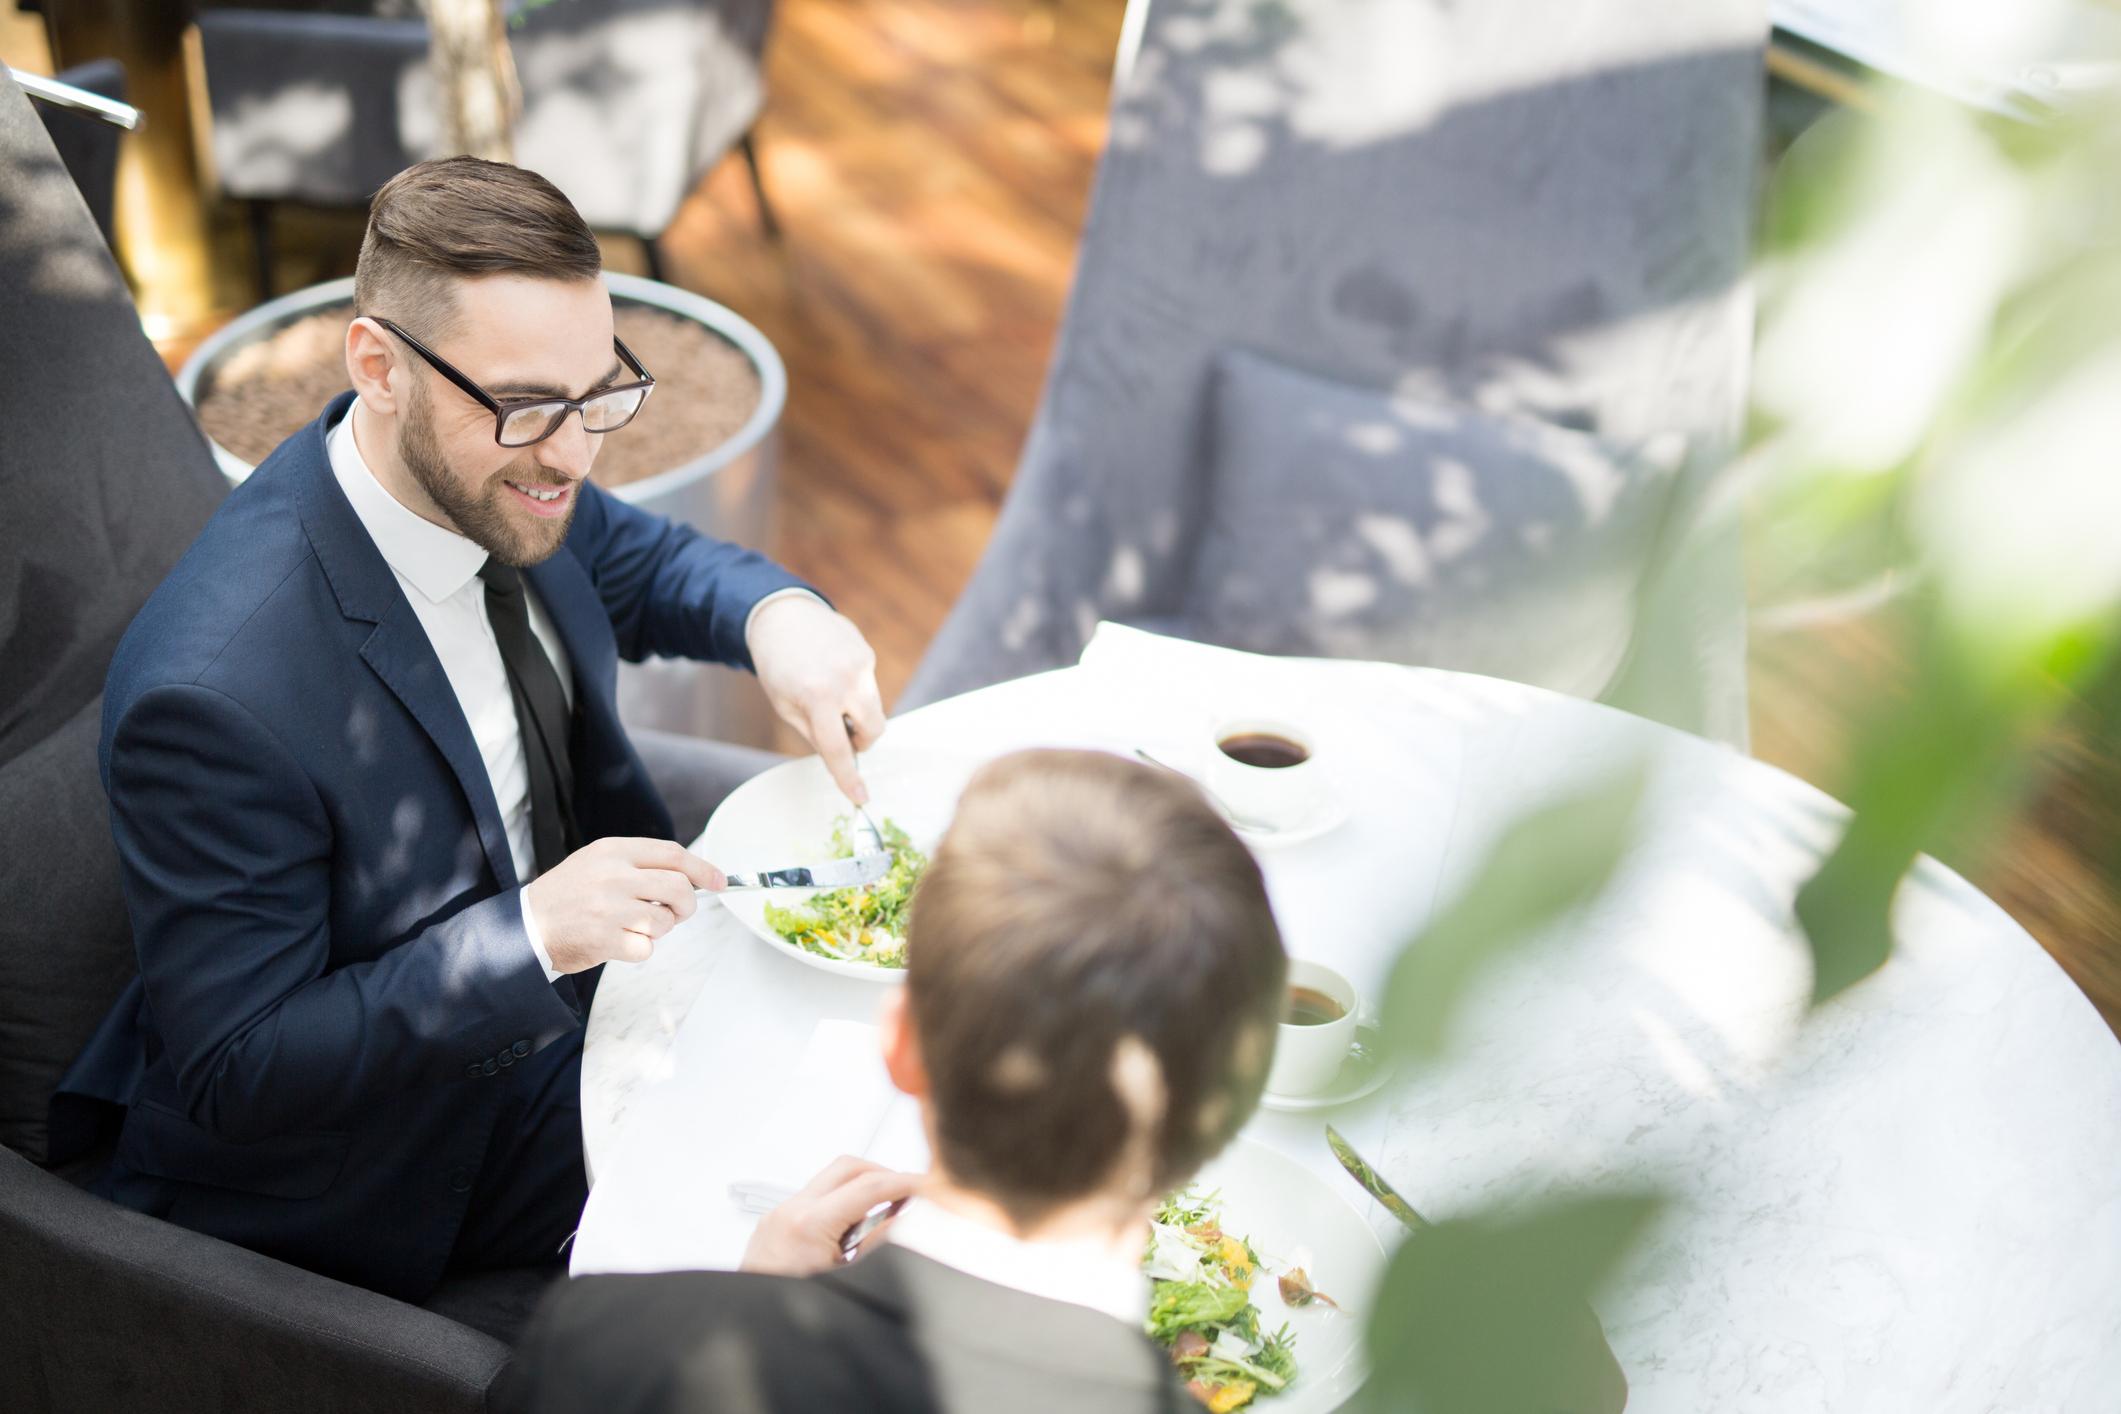 Lunch of businessmen